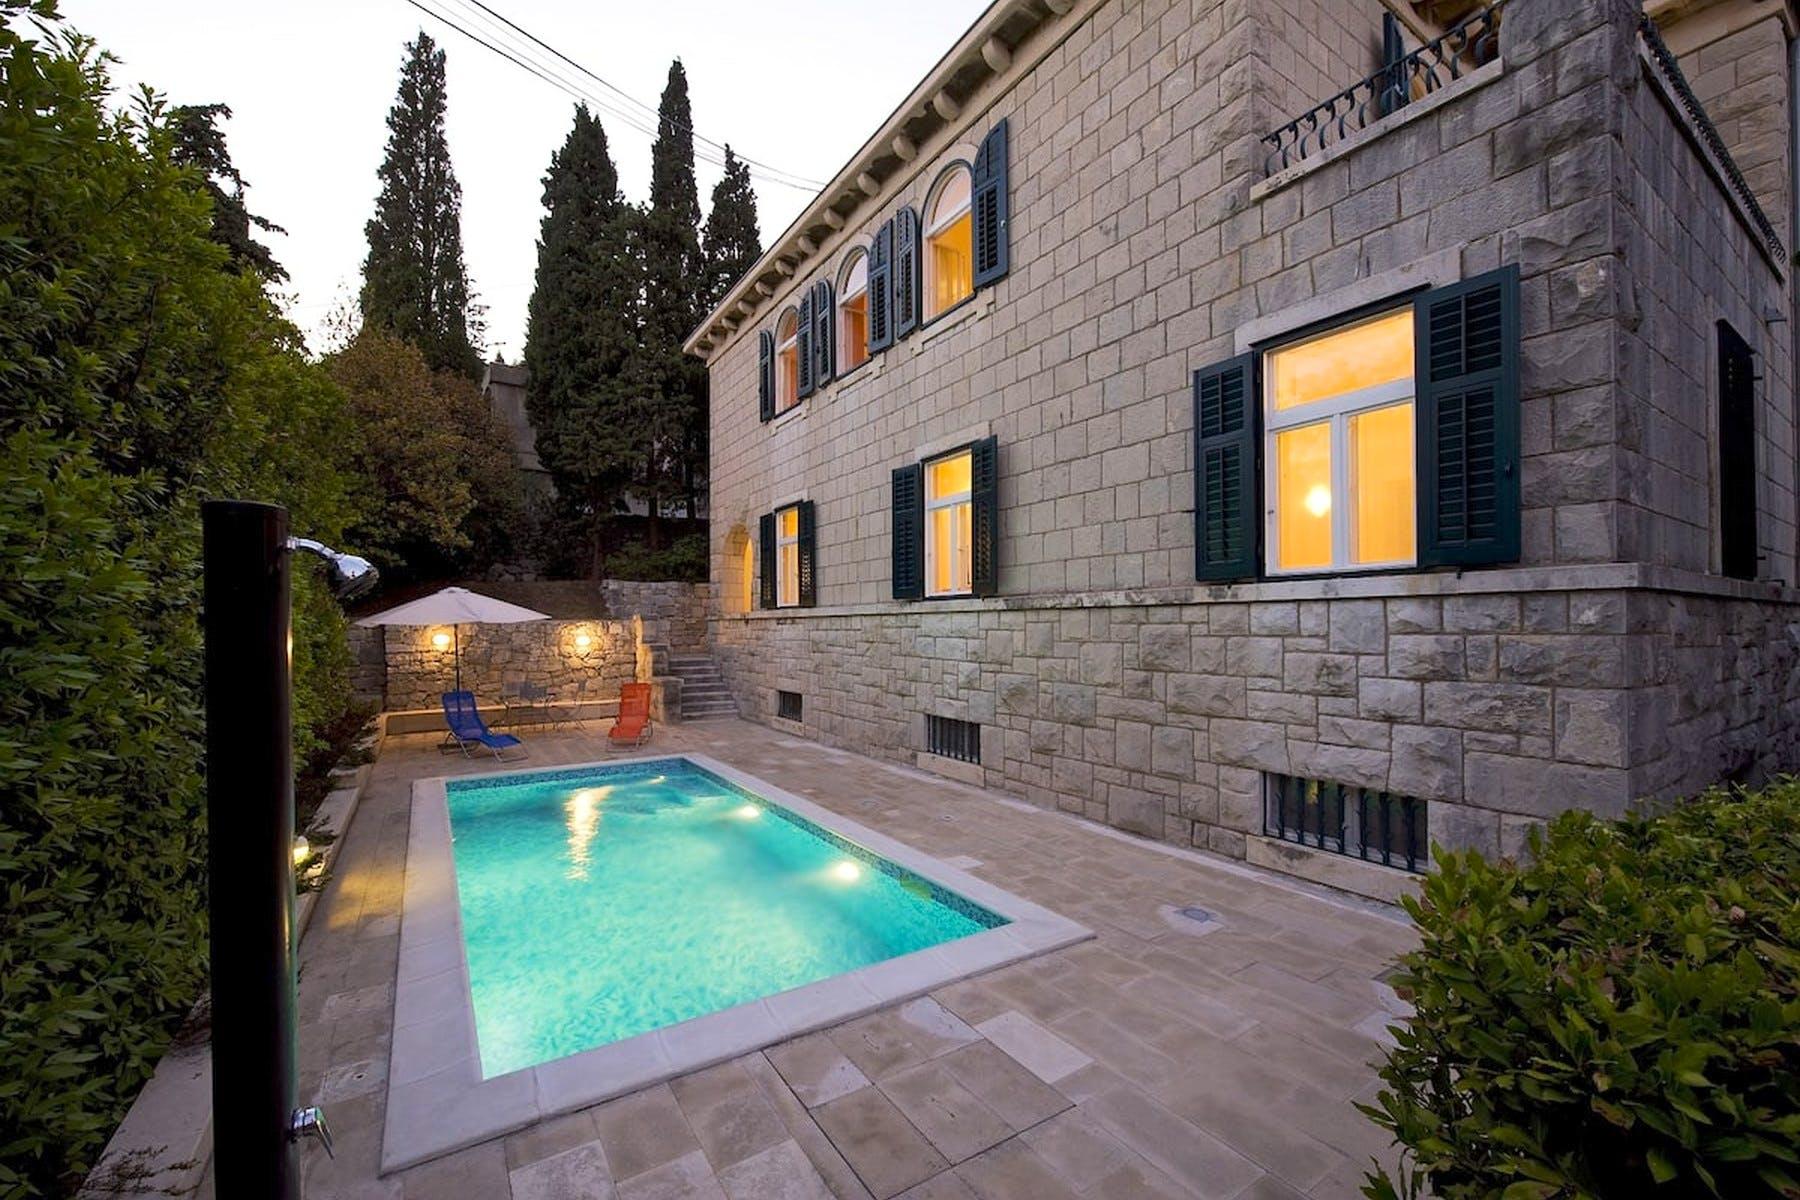 Kamena vila s bazenom u Splitu